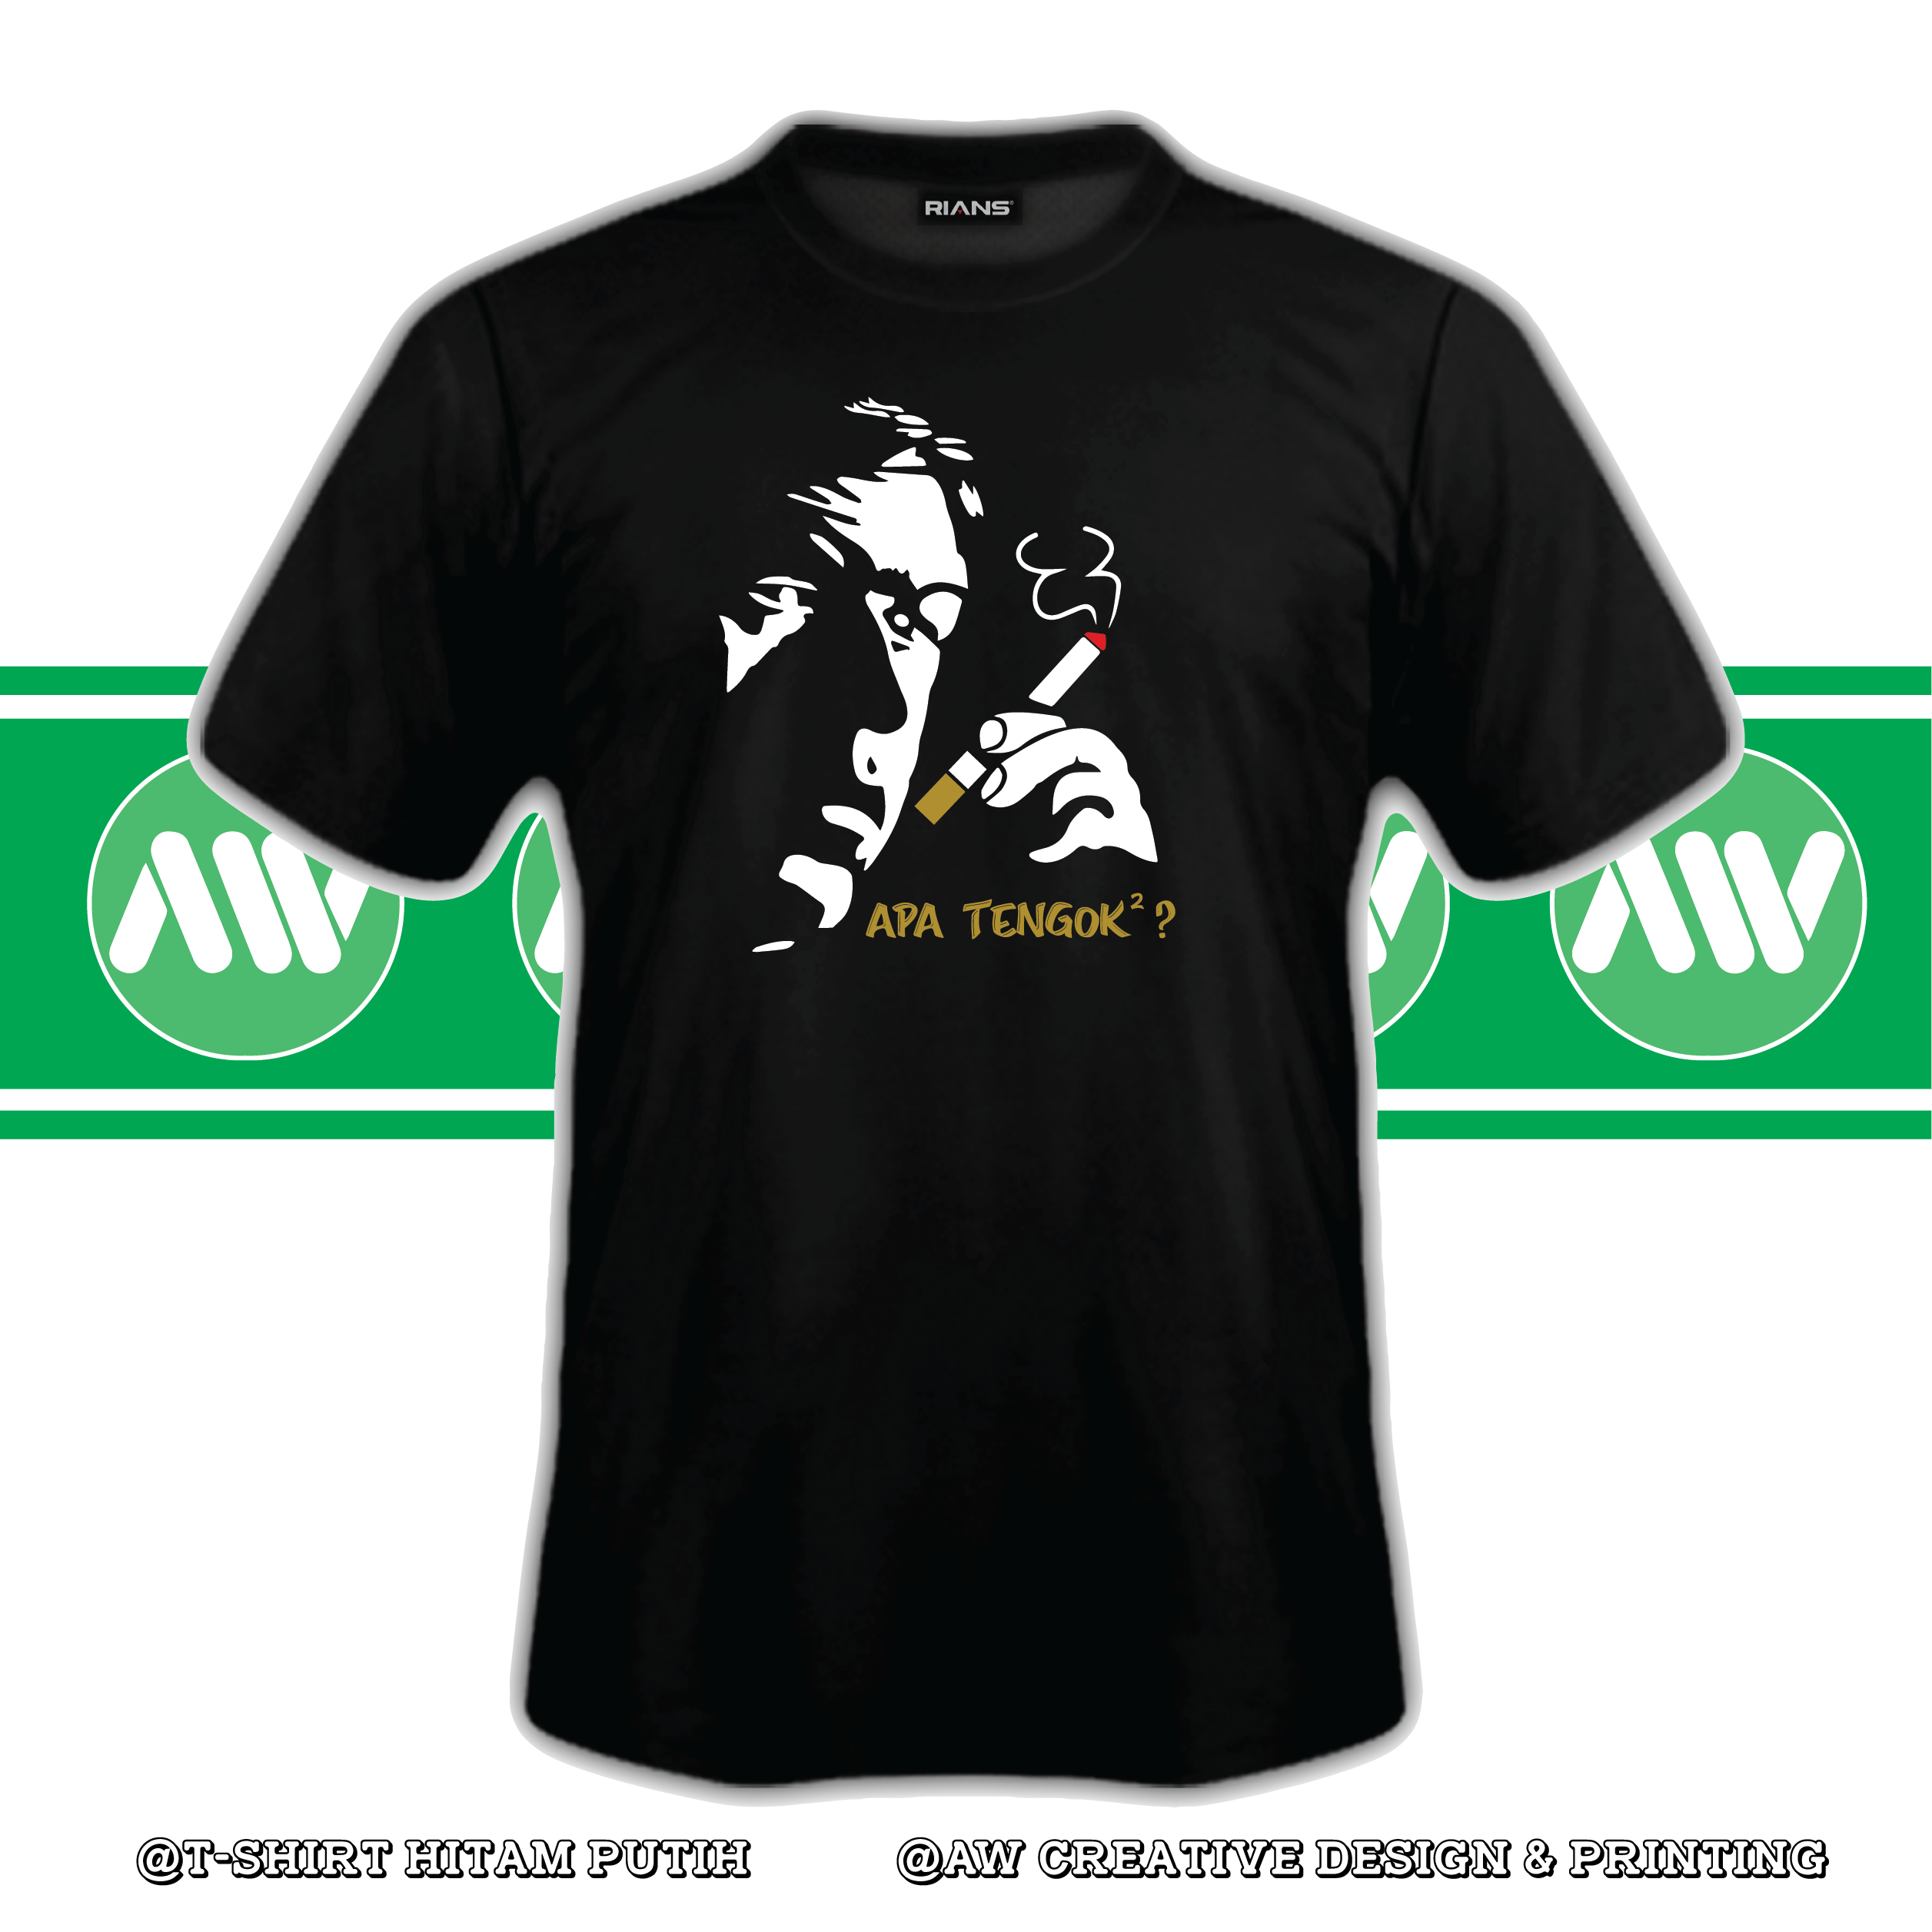 T-Shirt APA TENGOK TENGOK 4 Colour 100% Cotton Baju Tshirt Black White Hitam Putih Bossku